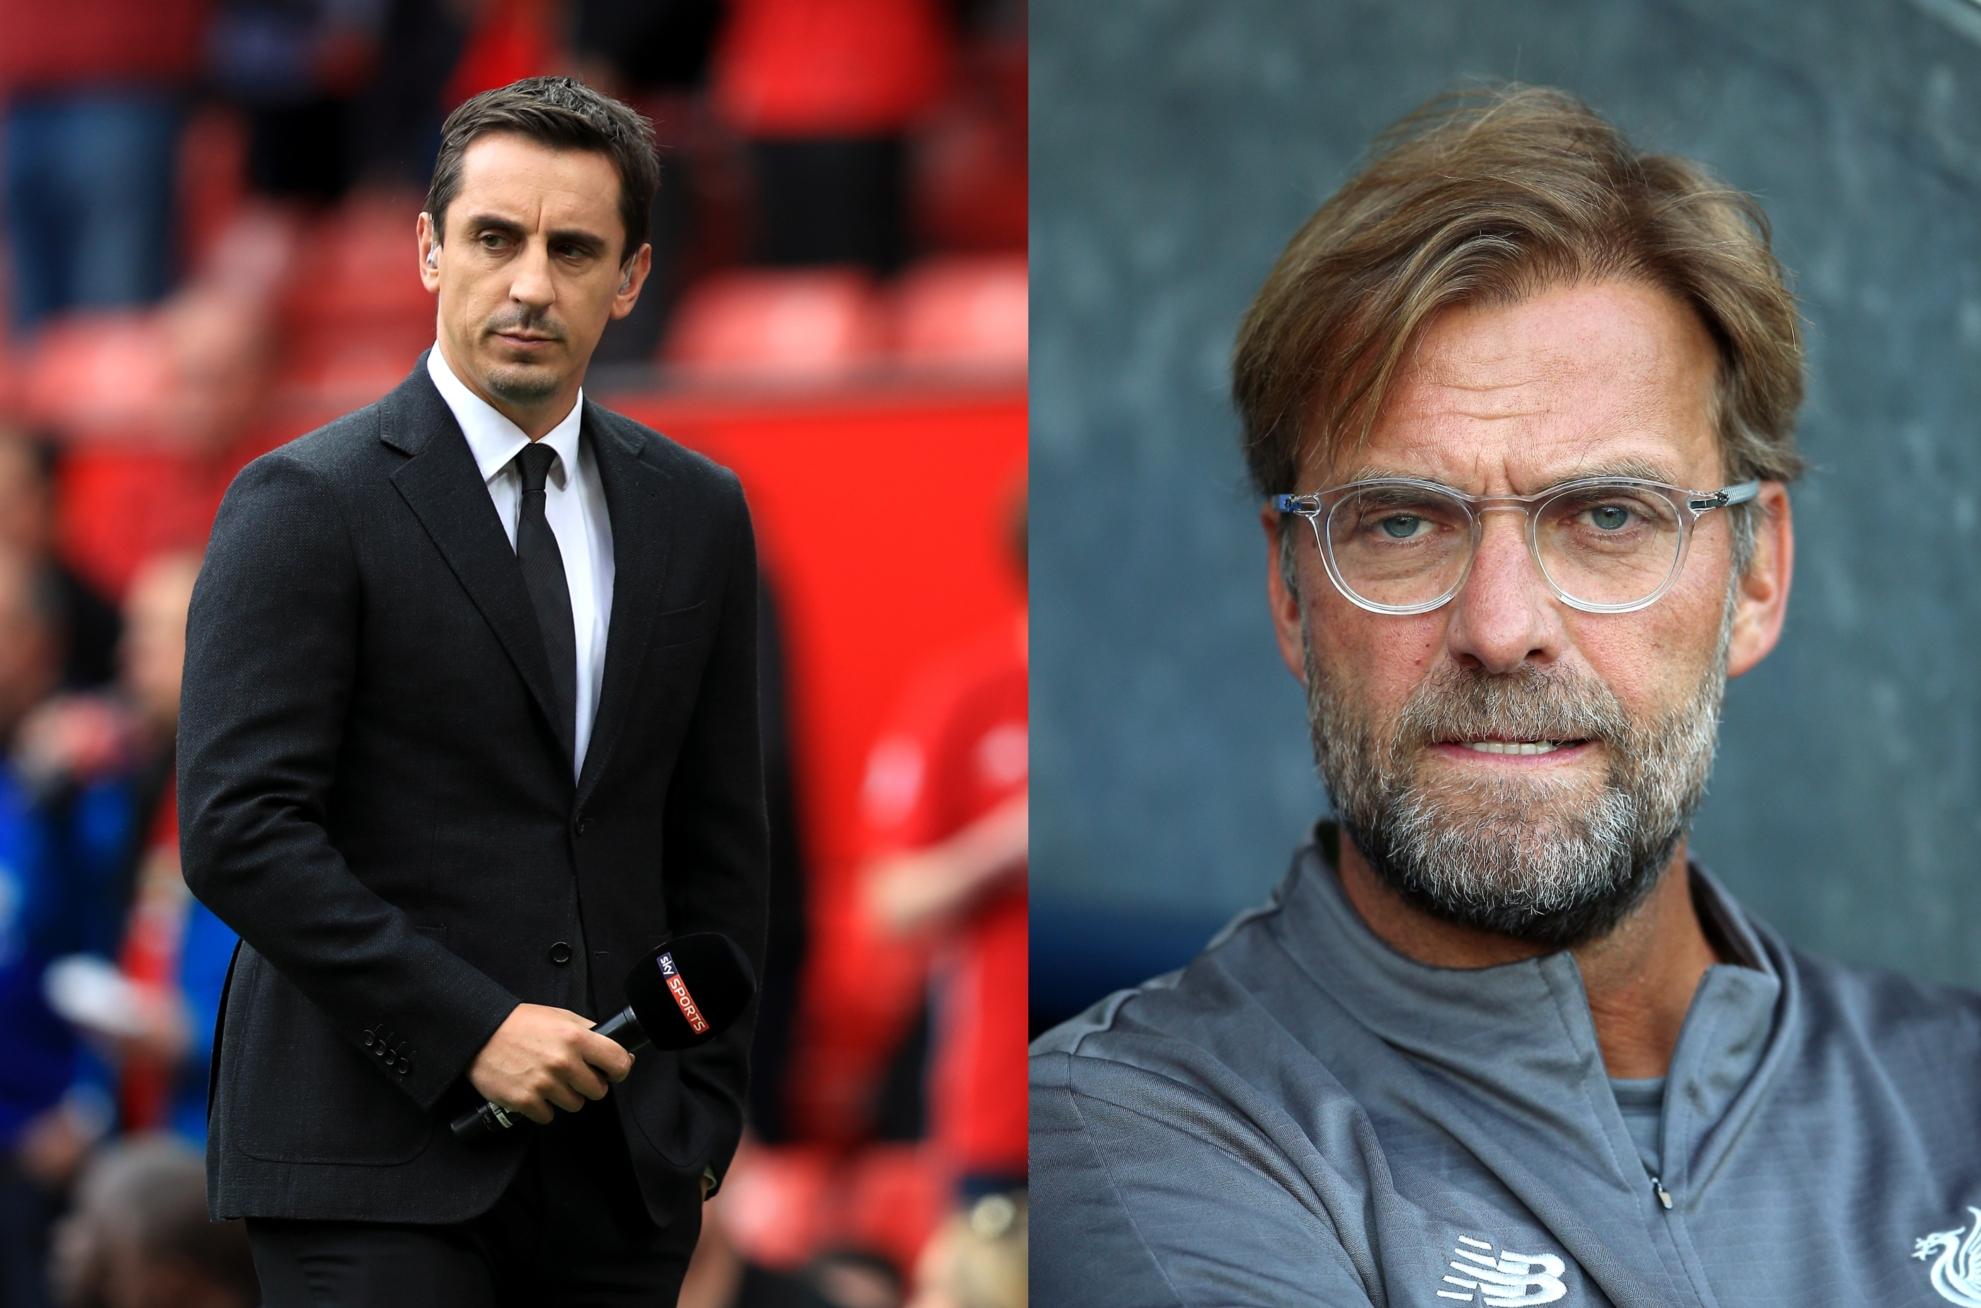 Jürgen Klopp Shuts Down Gary Neville On Liverpool's Premier League Challenge